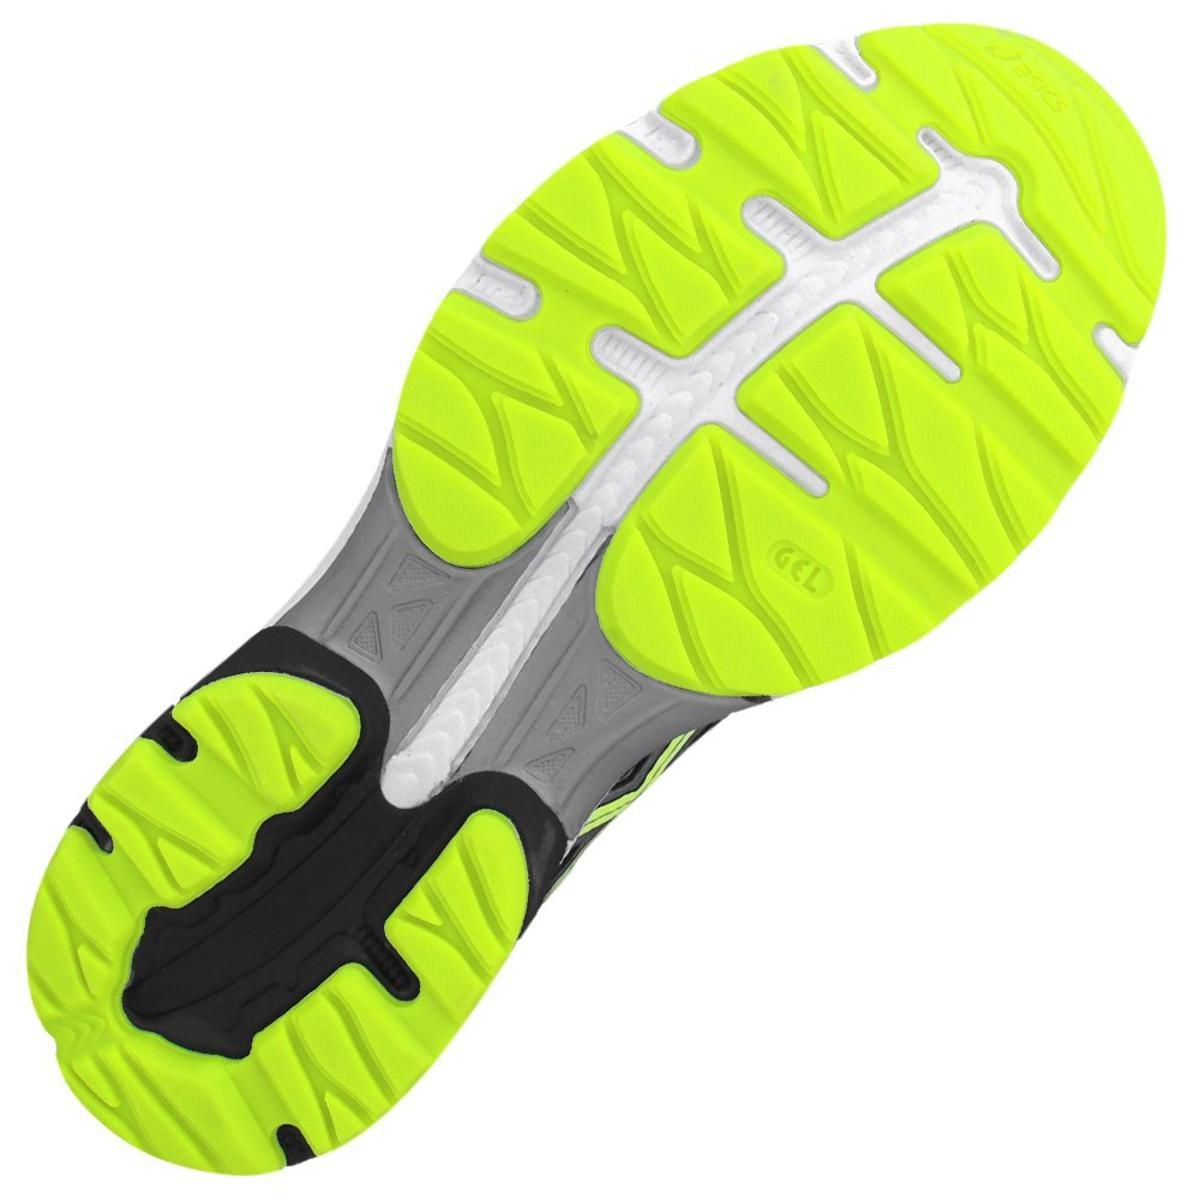 eee0e6c4d9 tenis asics gel nagoya masculino cinza original - pta entreg. Carregando  zoom.